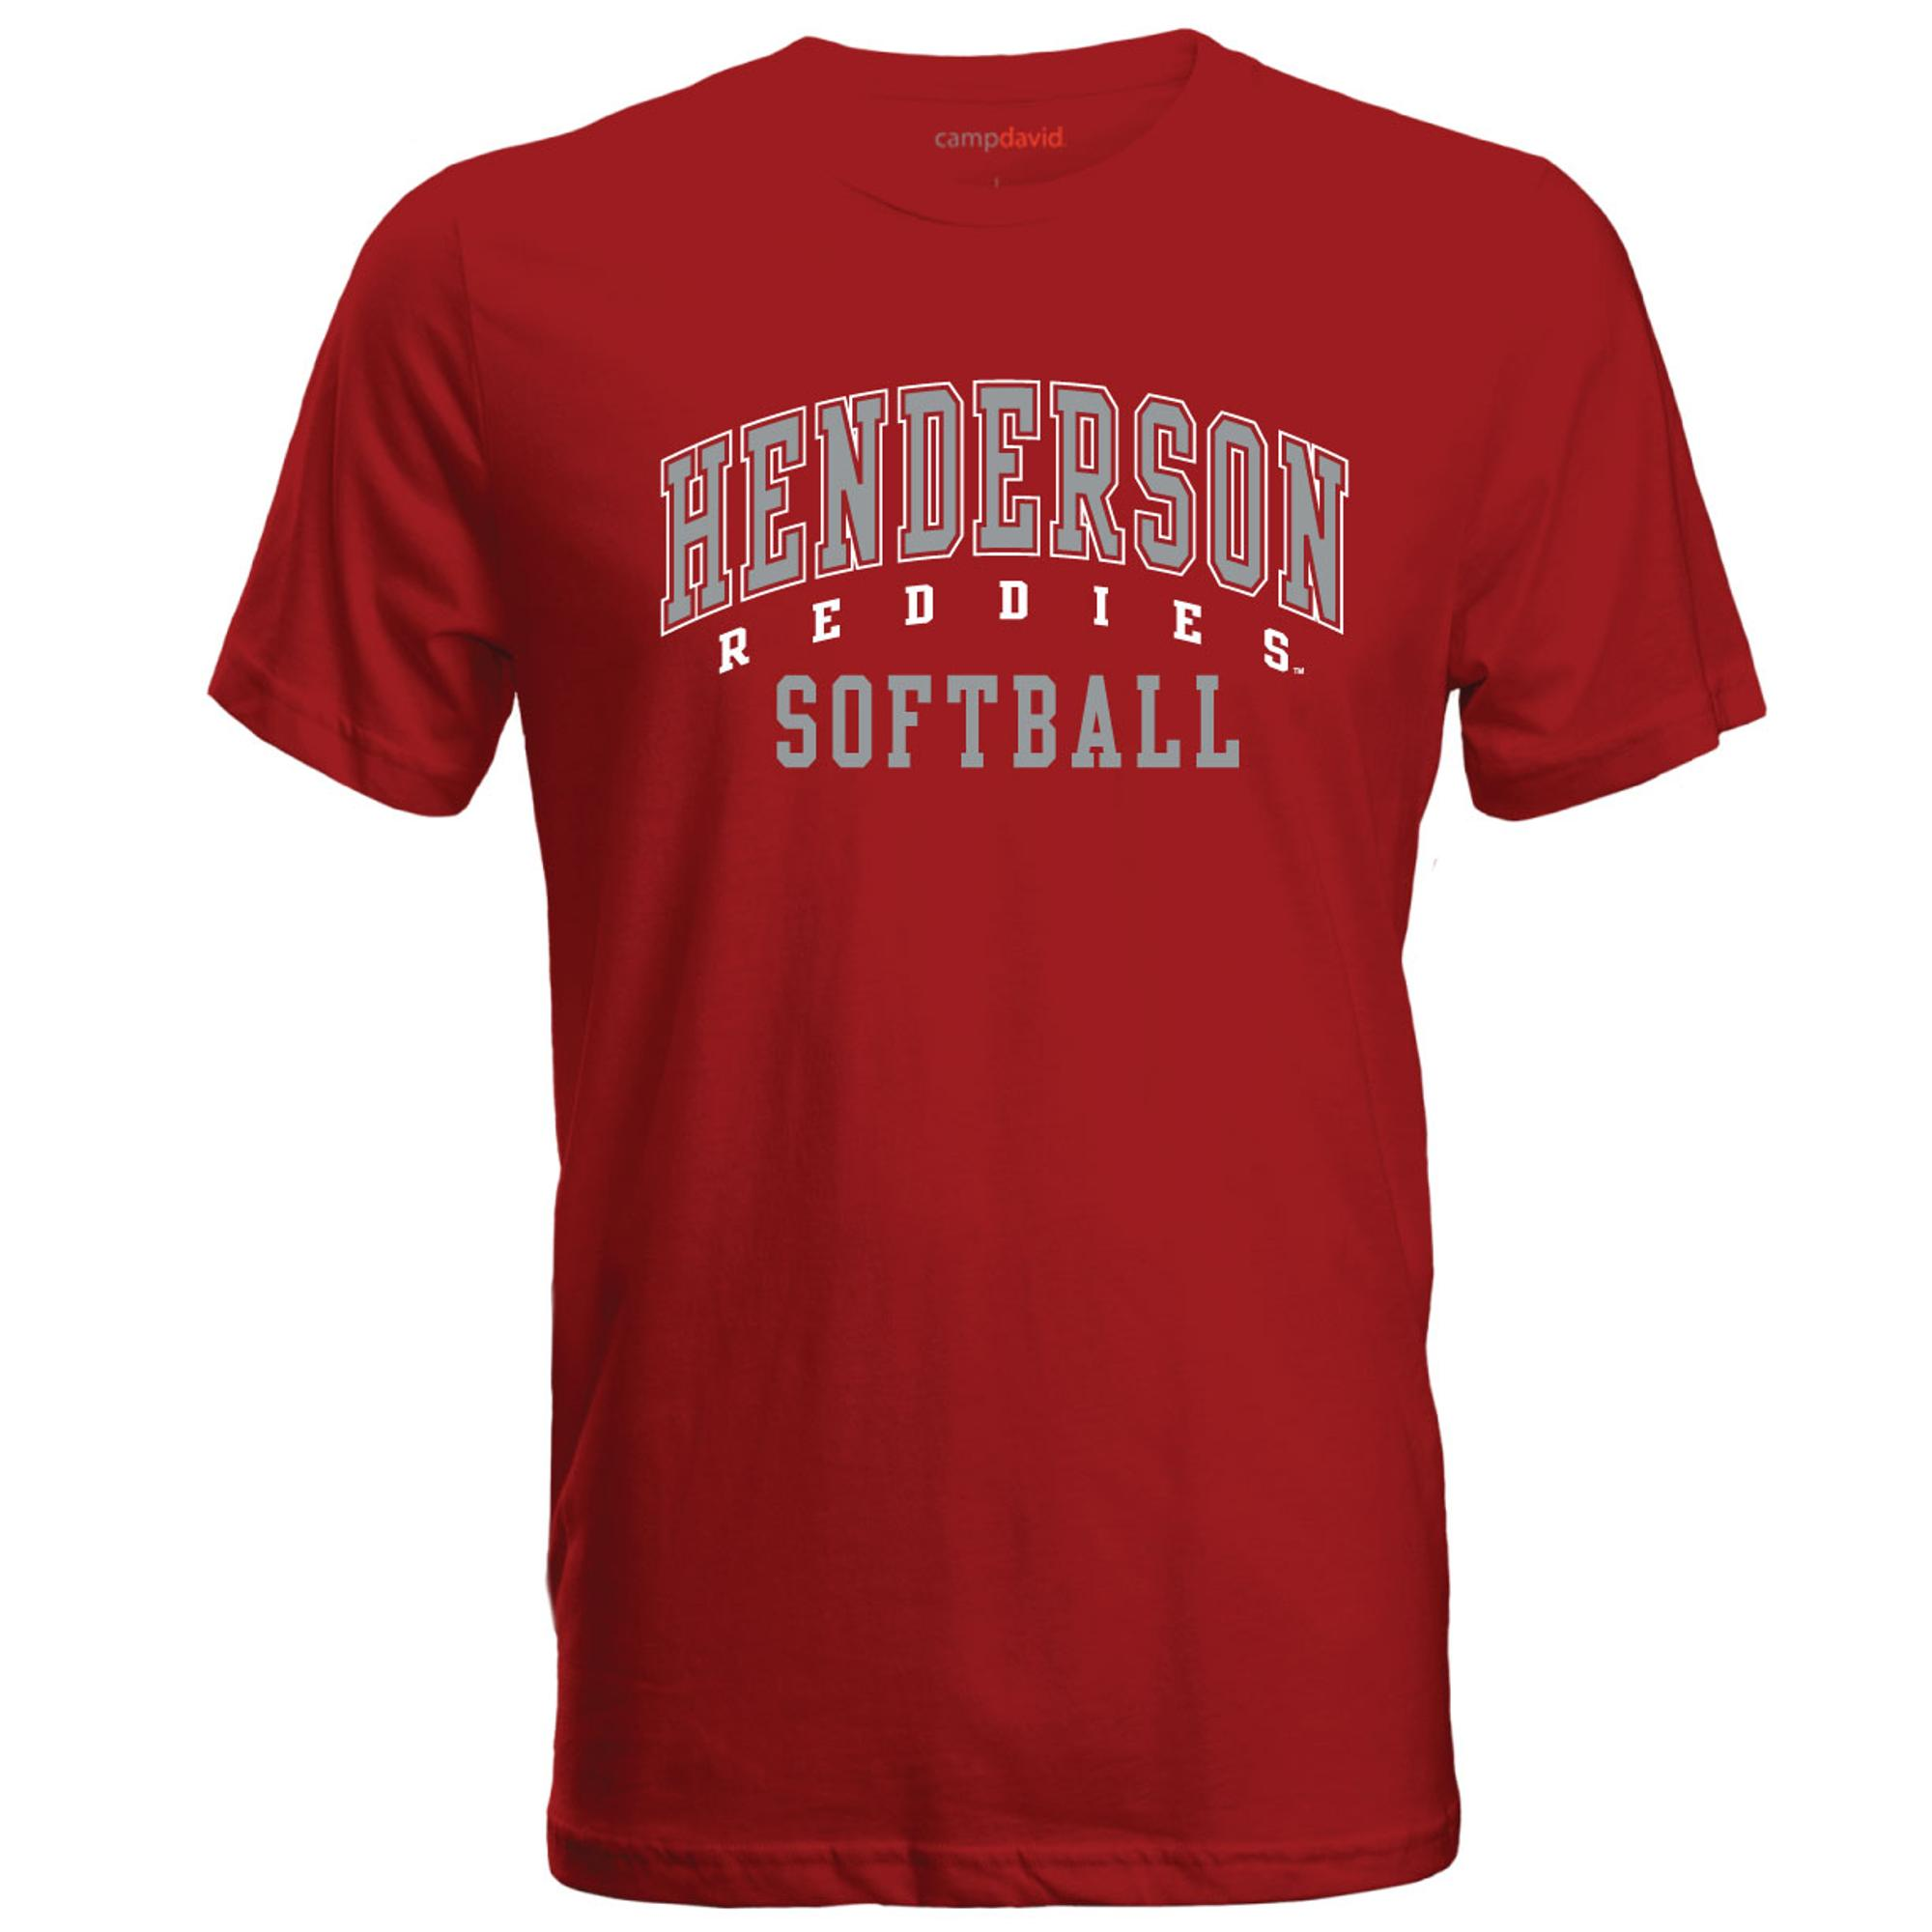 image of: Henderson Reddies Softball Cruiser Tee